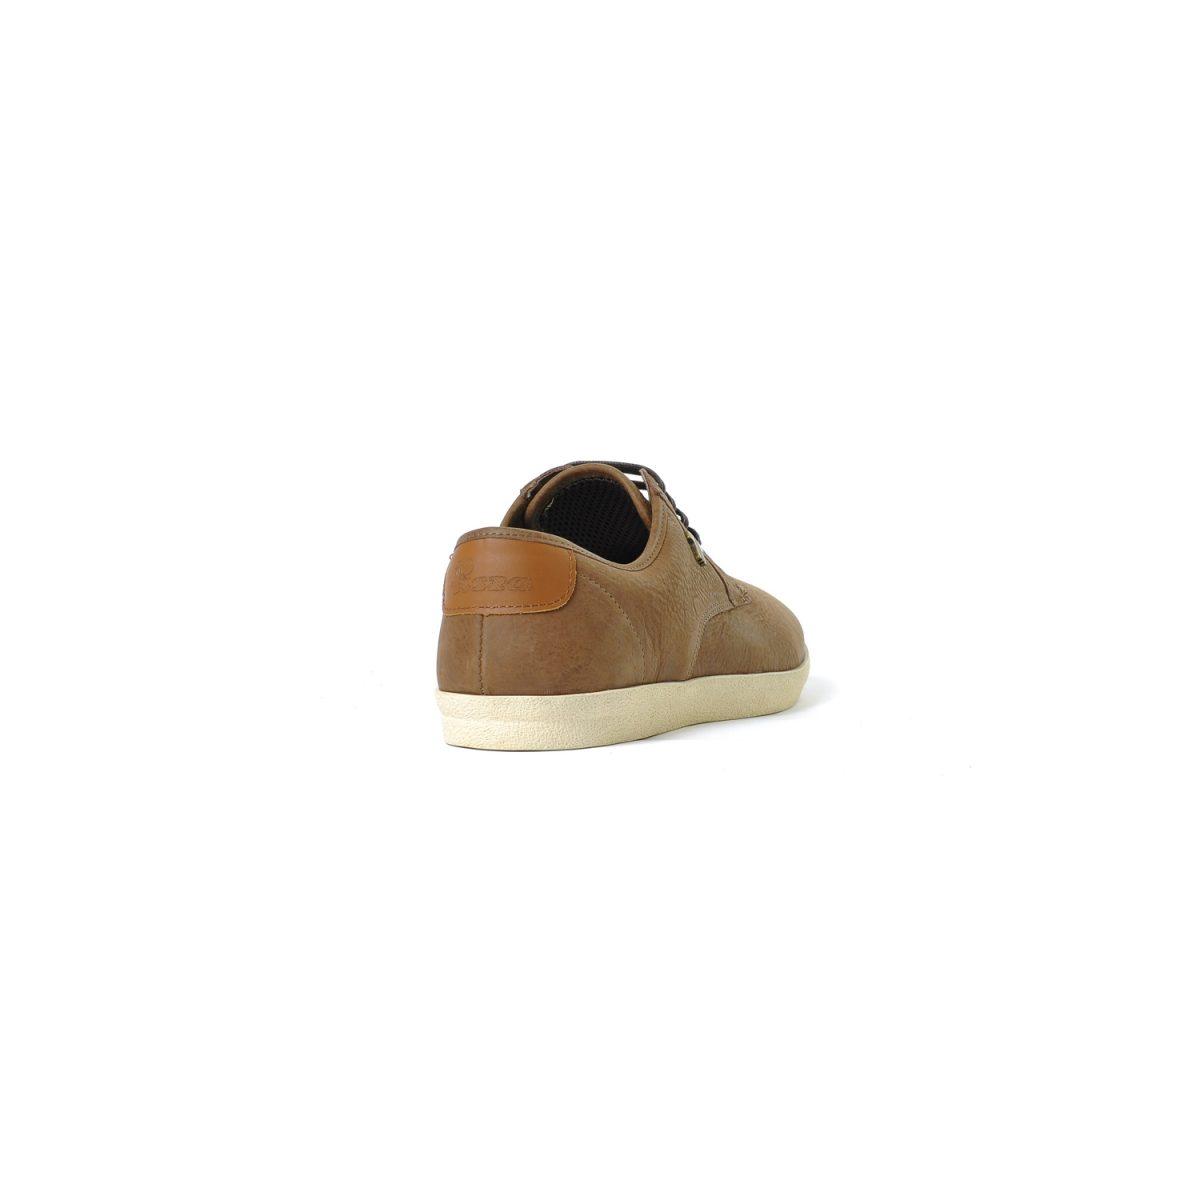 Tisza cipő - City - Barna bőr